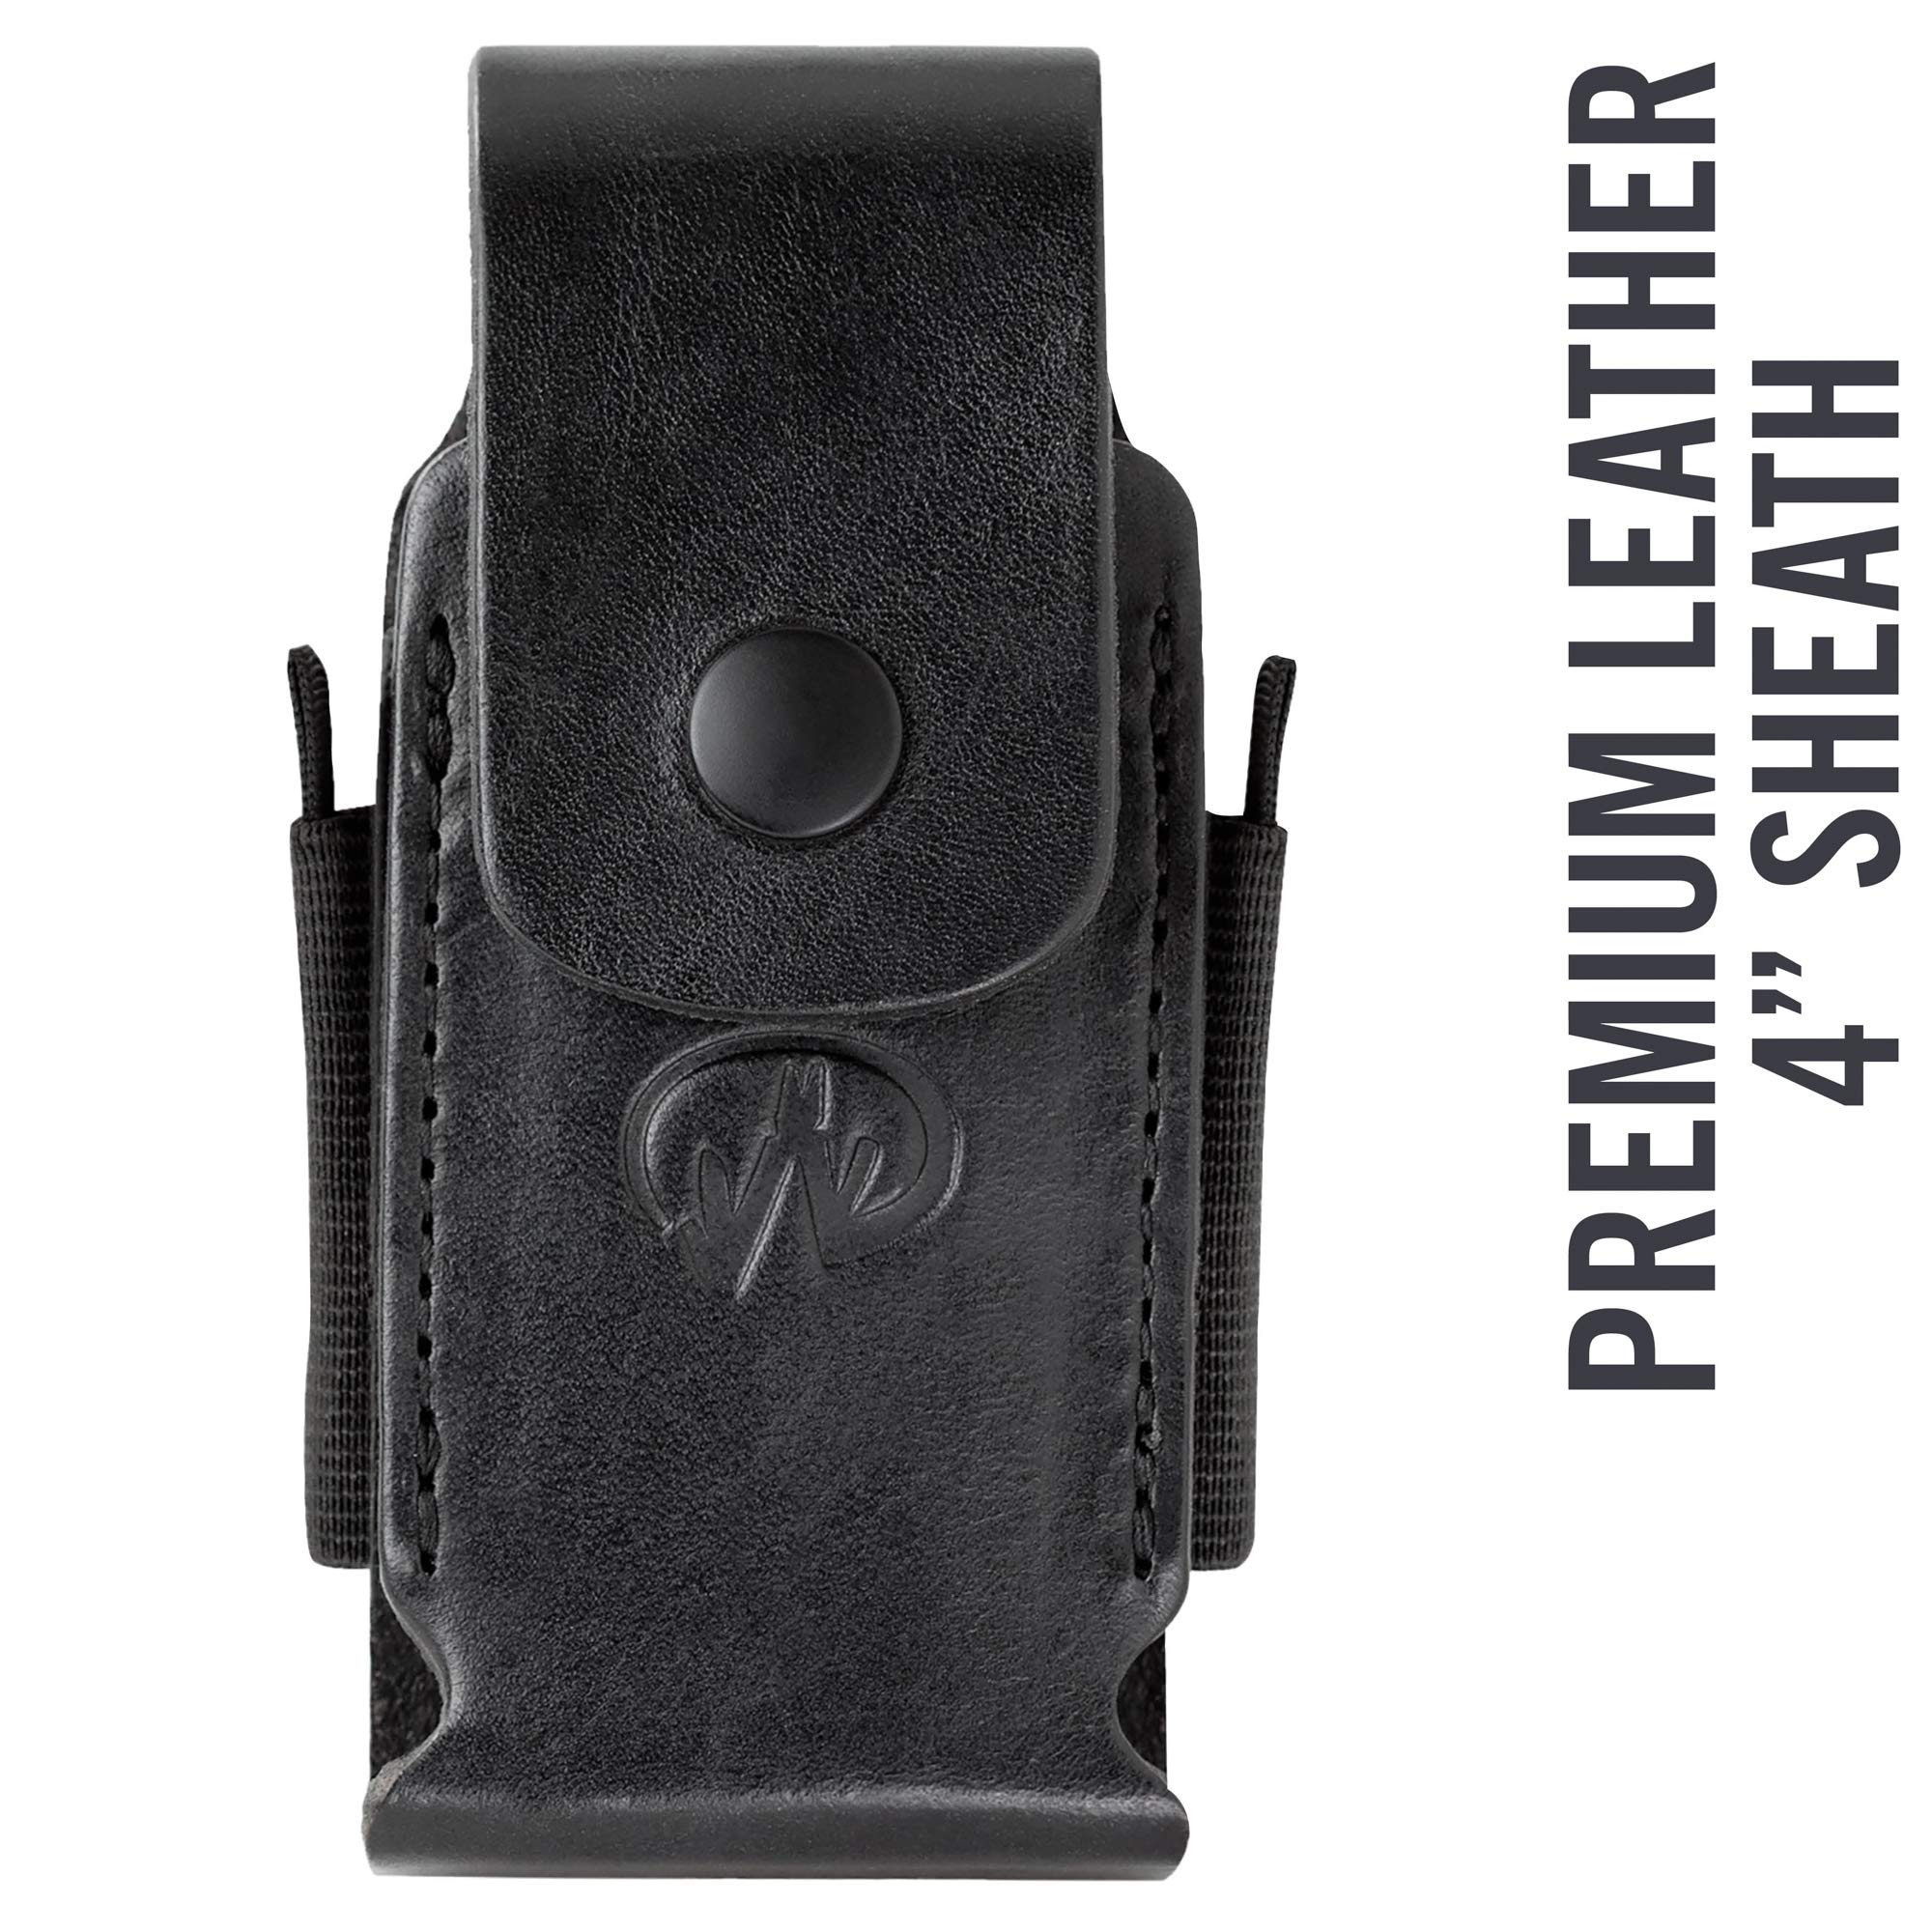 Leatherman - Premium Leather Sheath with Pockets, Fits 4'' Tools - Black